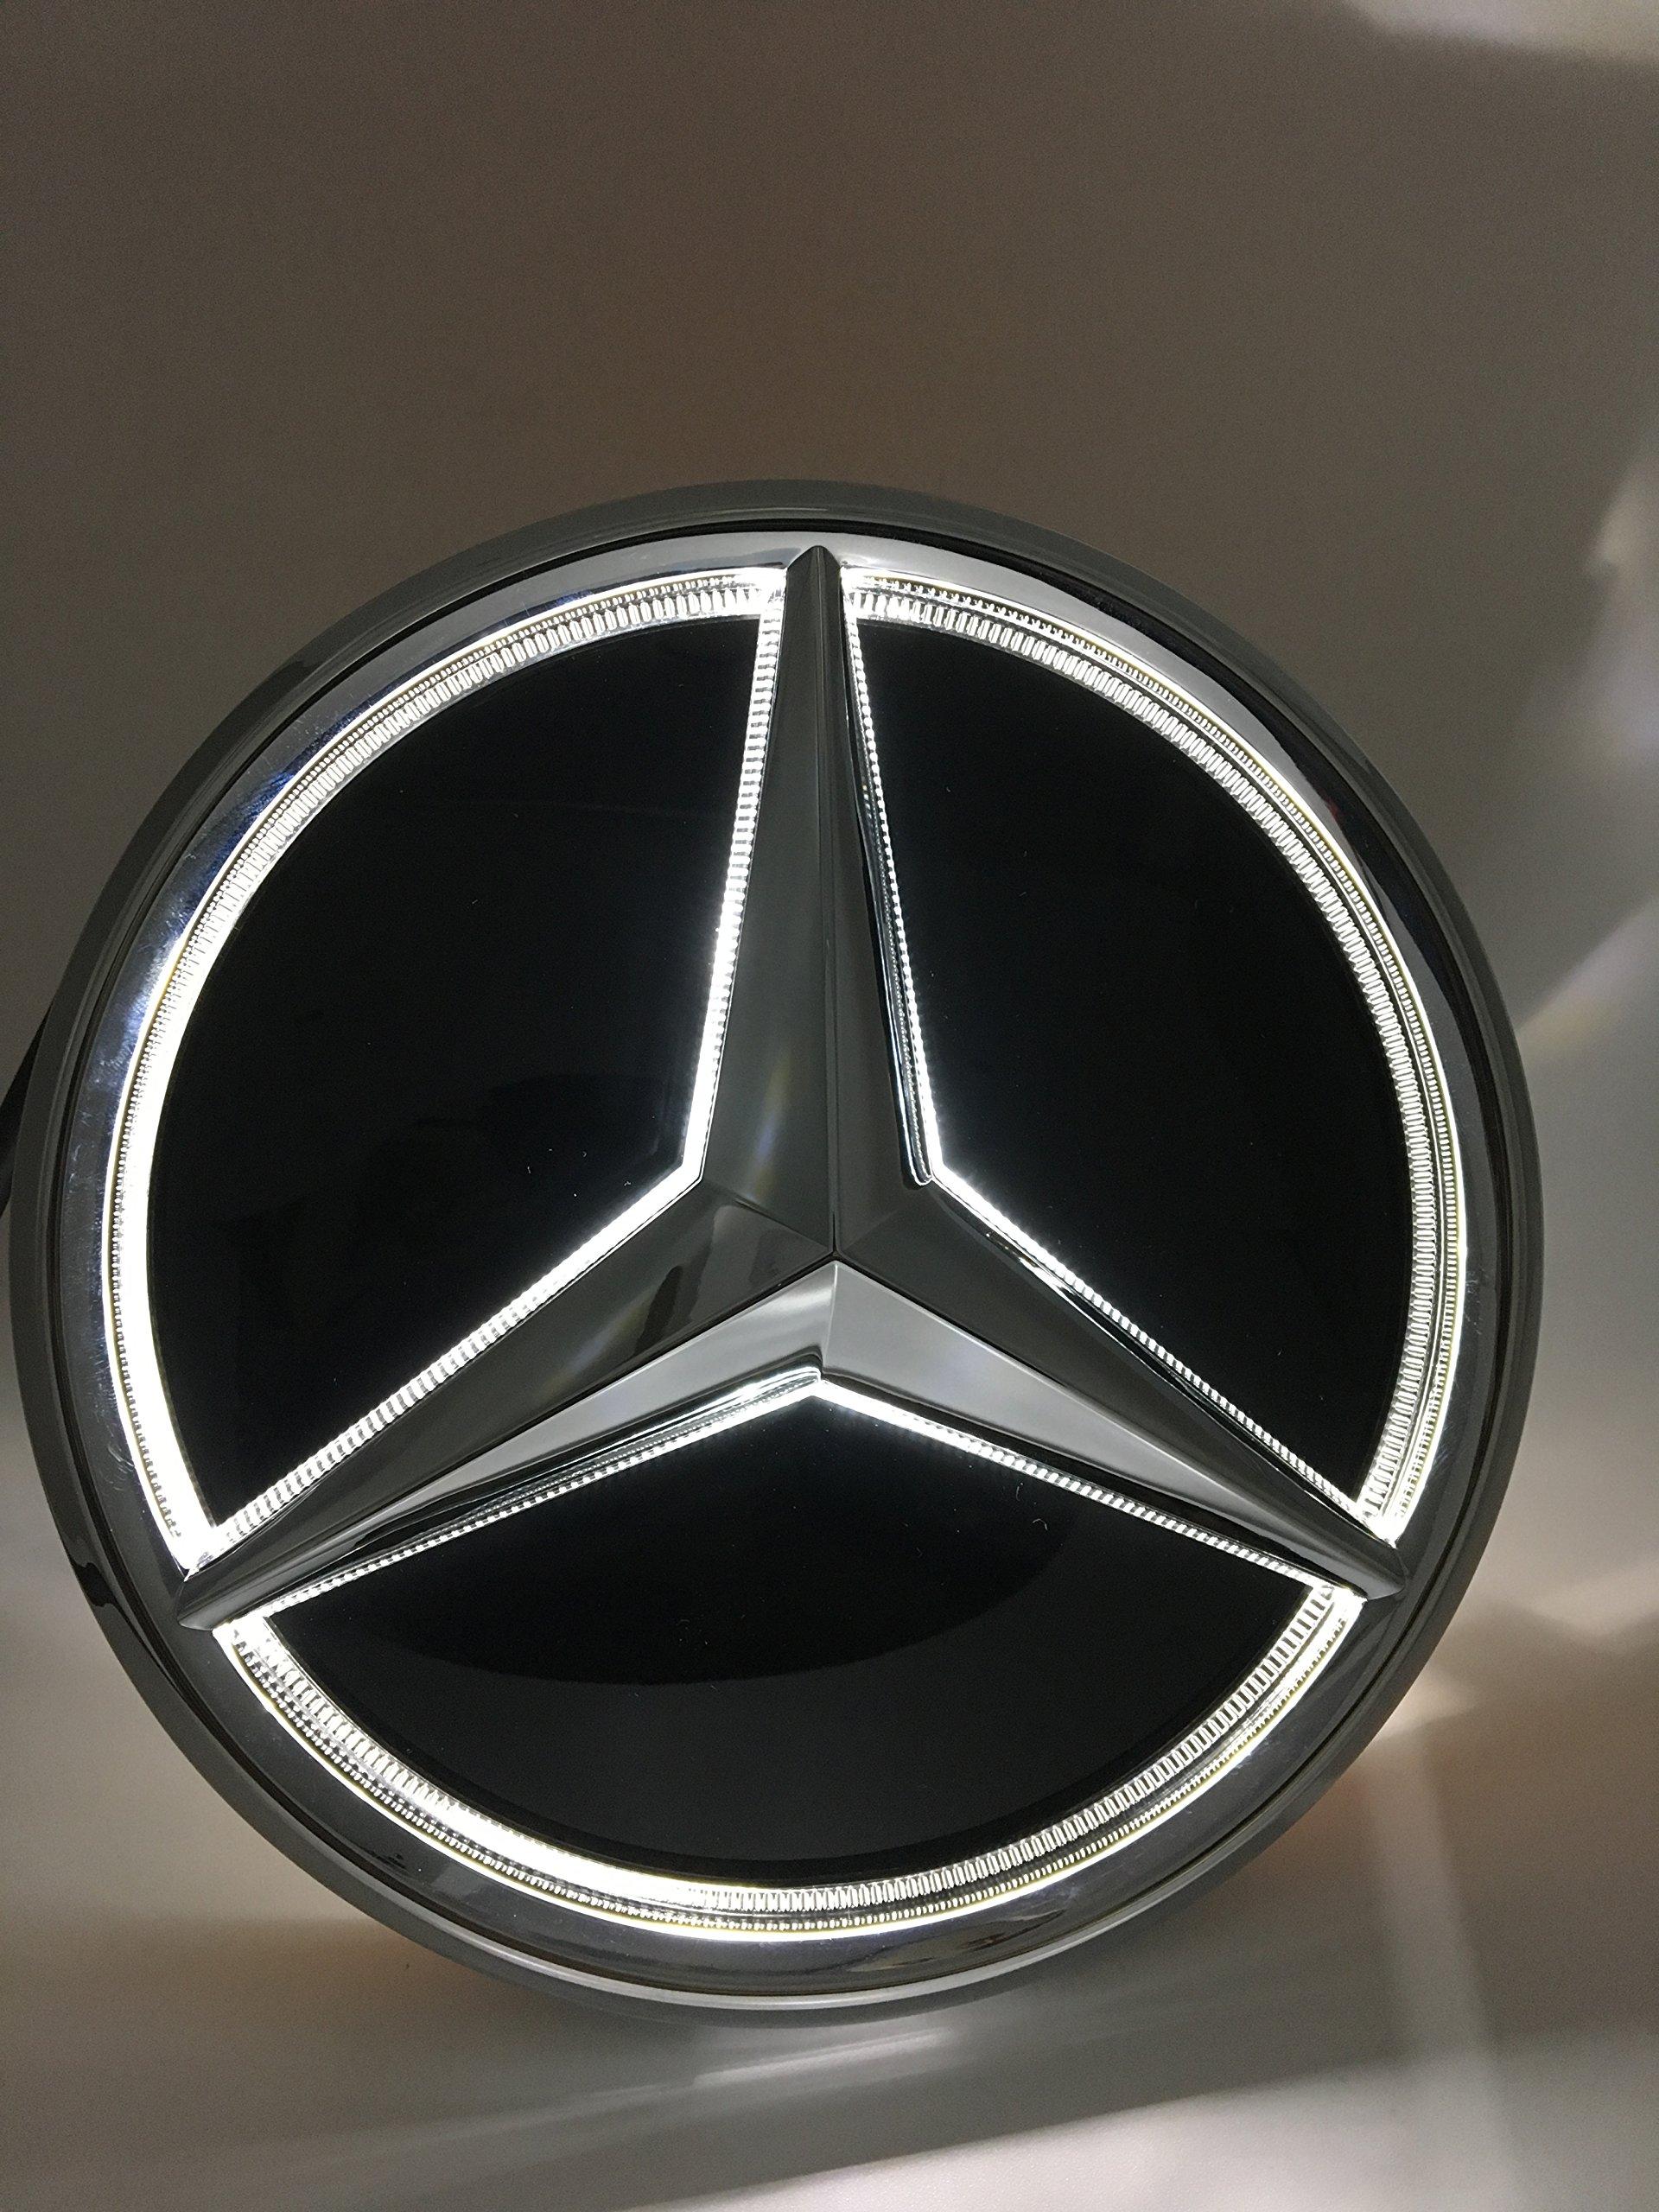 Cszlove Car Front Grilled Star Emblem LED Illuminated Logo for Mercedes Benz 2013-2015 A B C E S GLK ML Class Center Front Badge Lamp Light White-Mirror Surface